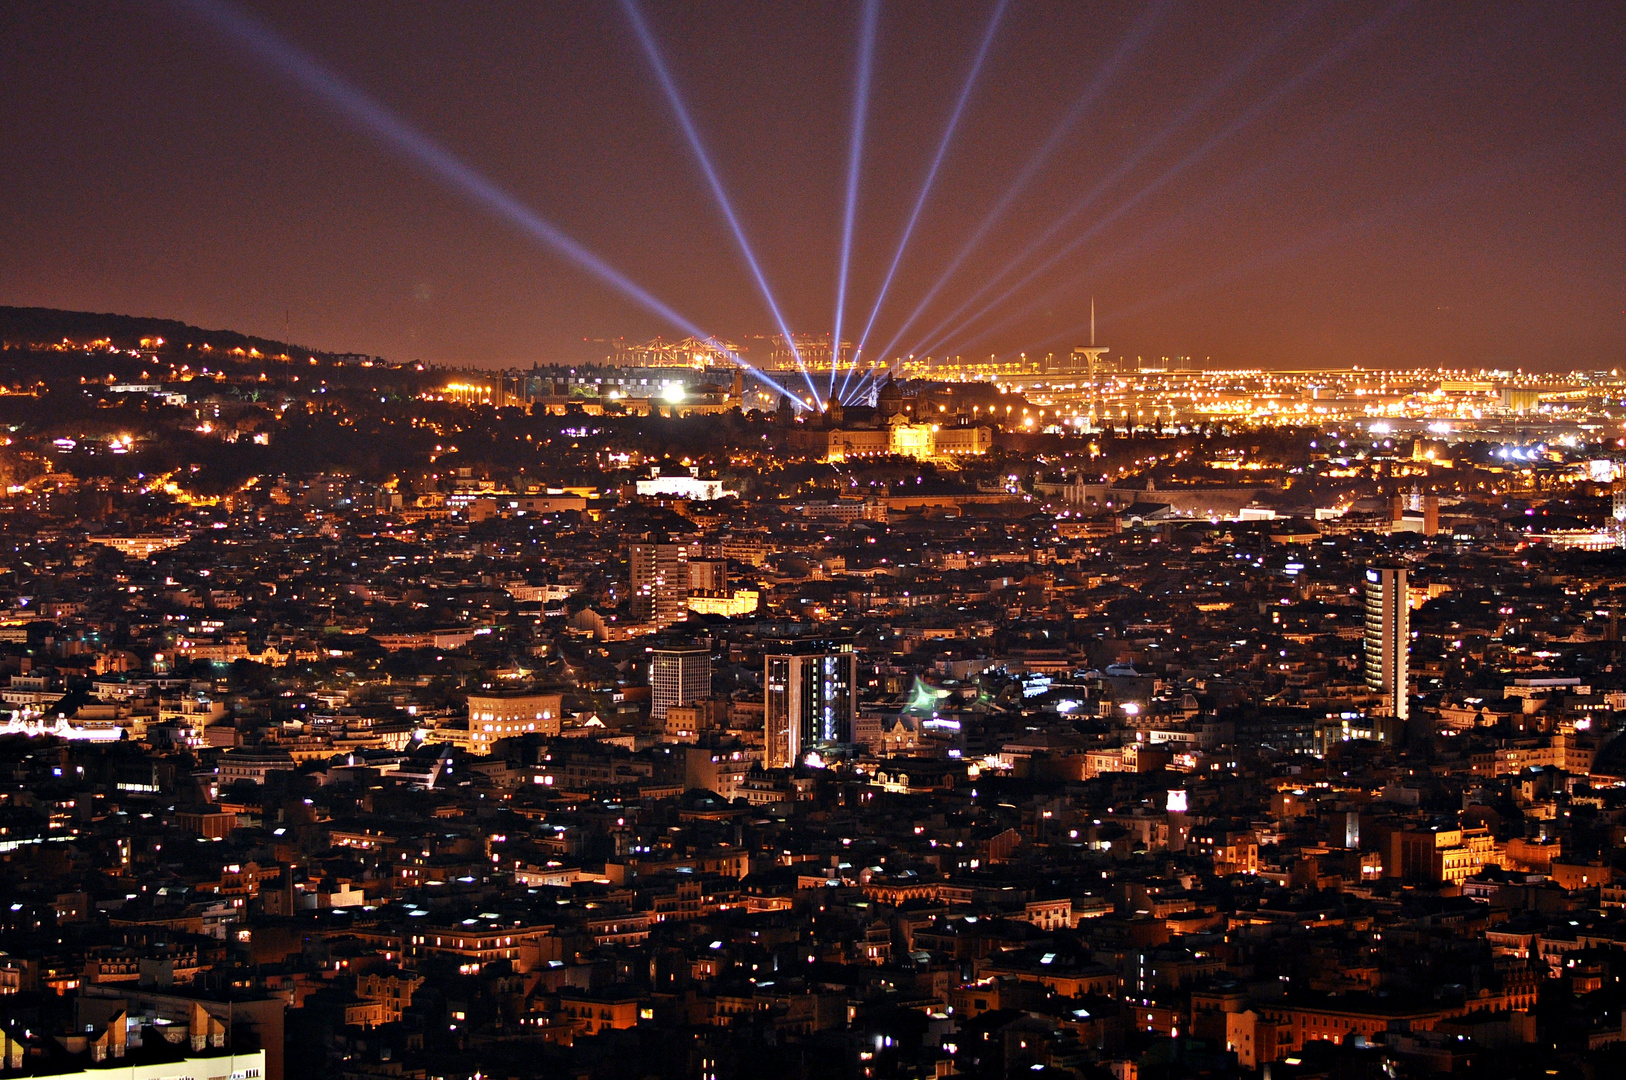 Barcelona lights